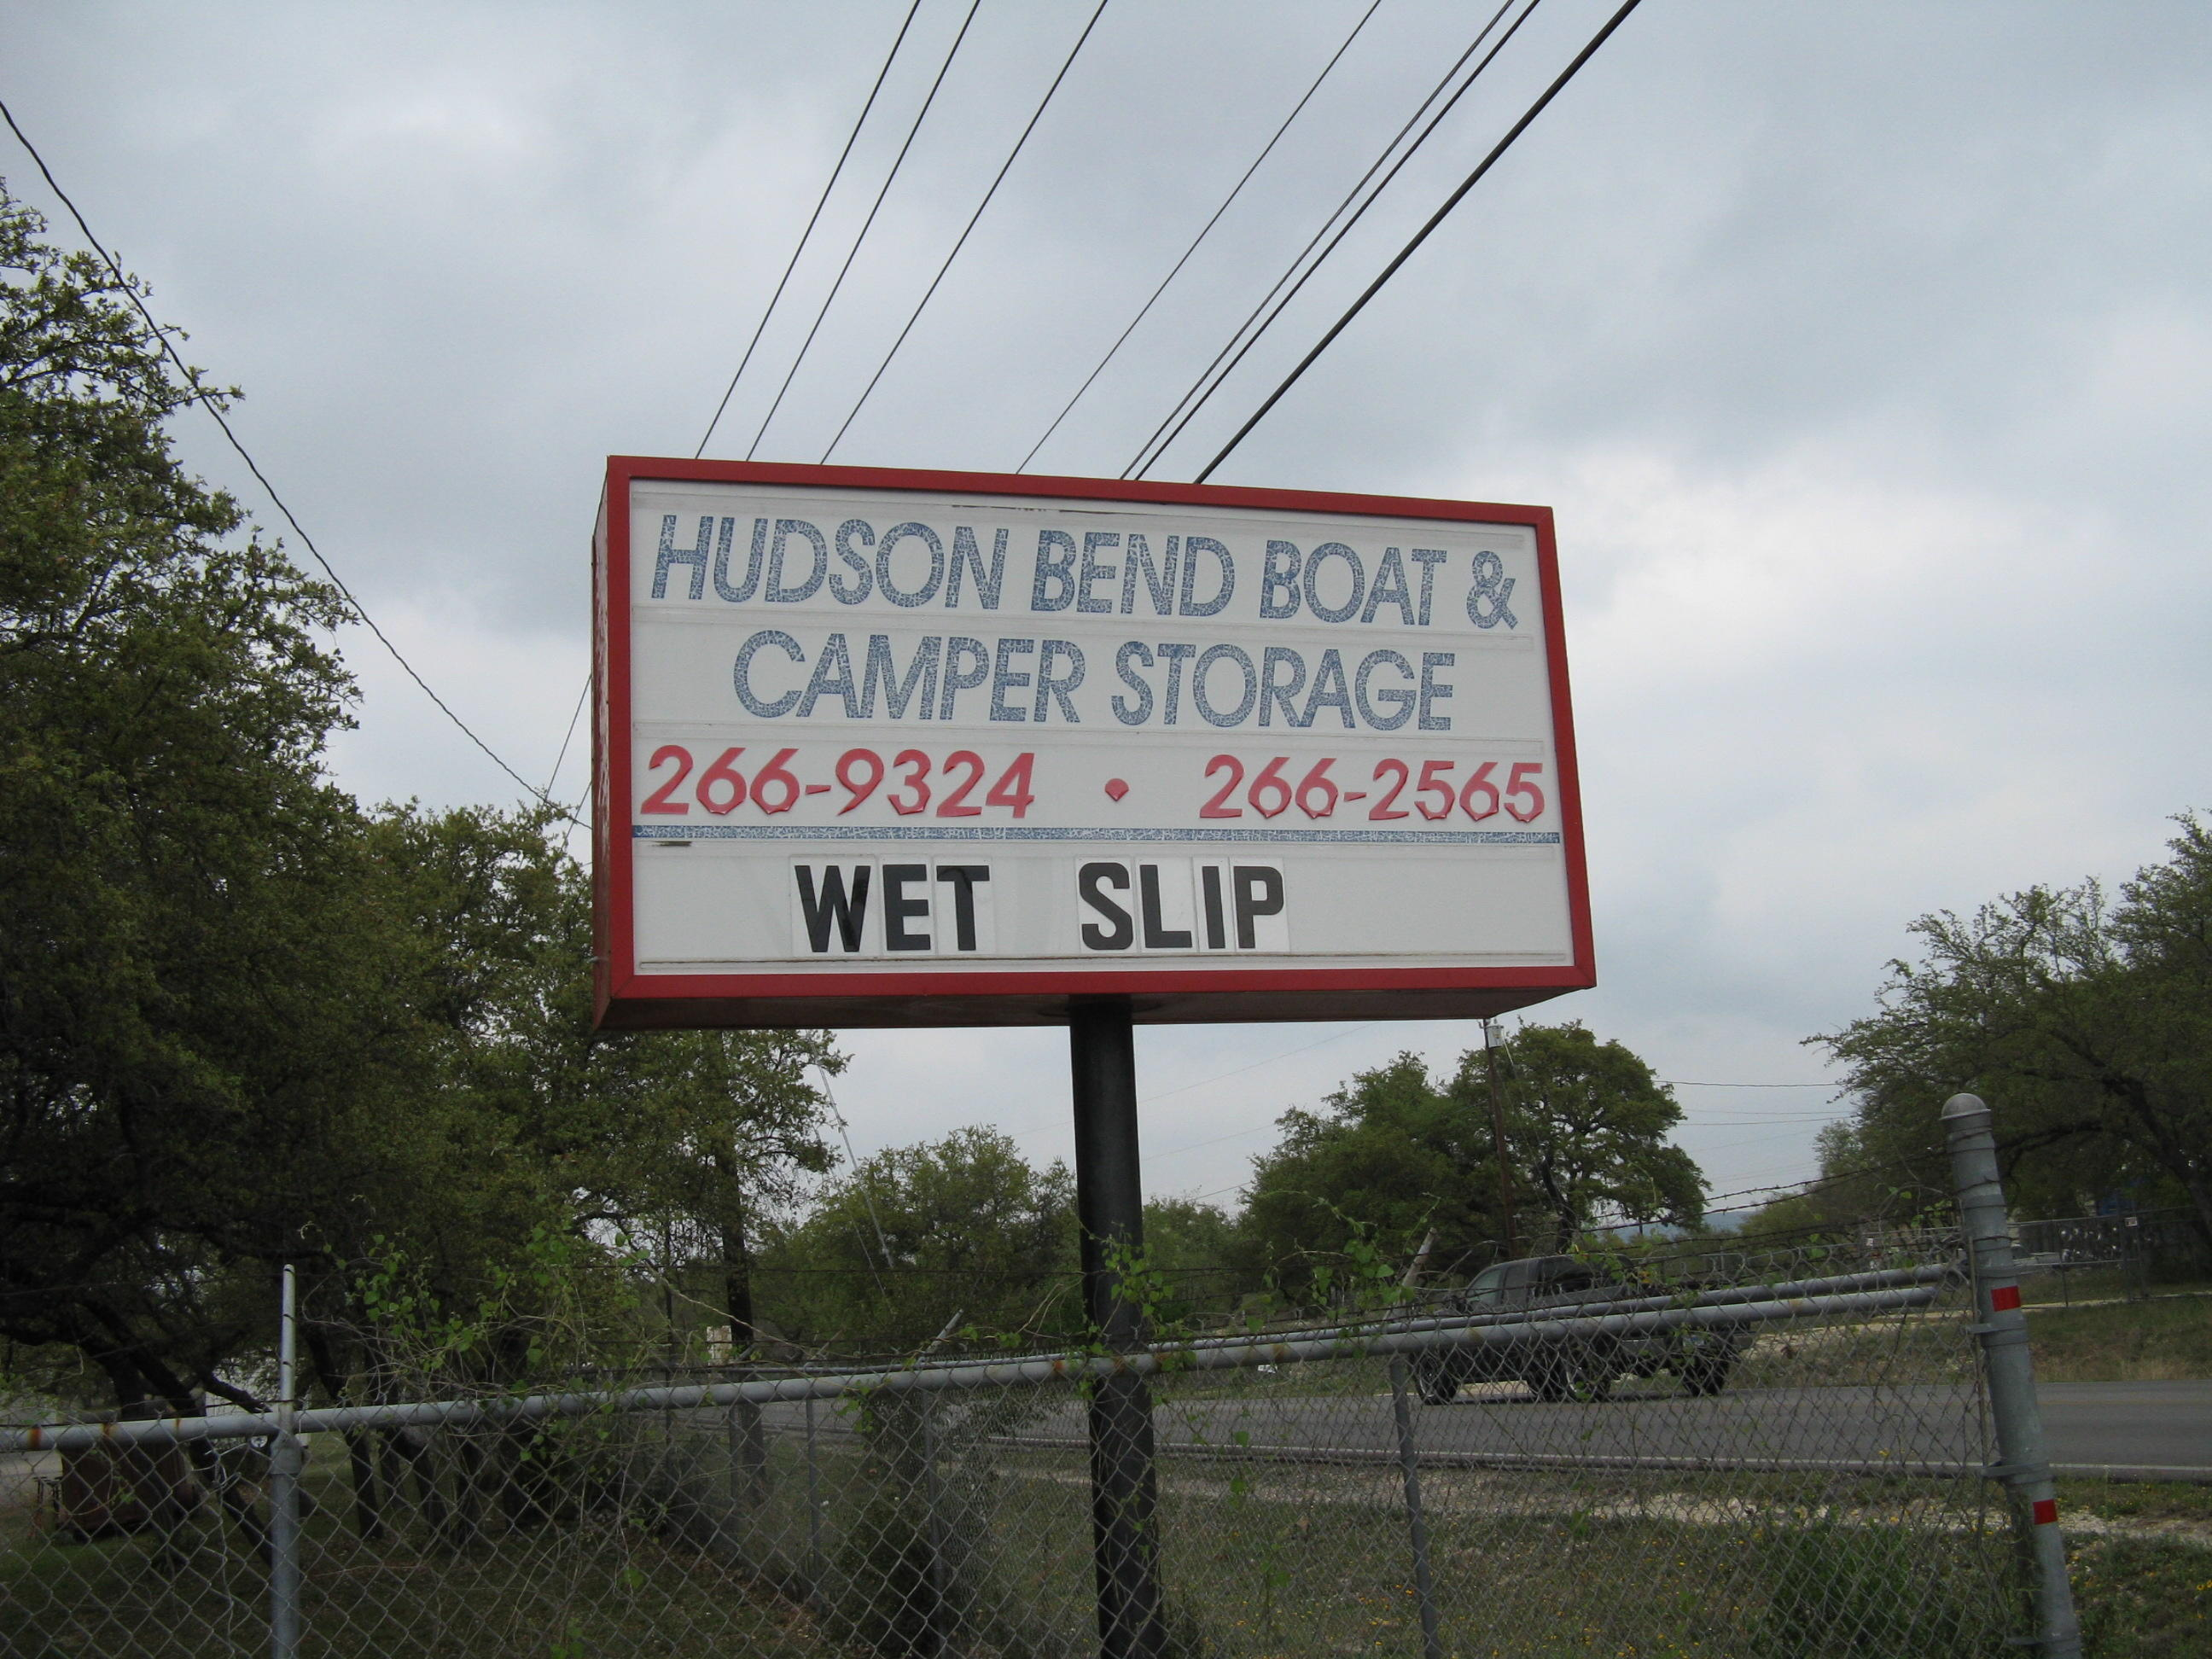 Hudson Bend Boat Amp Campers Storage In Austin Tx 78734